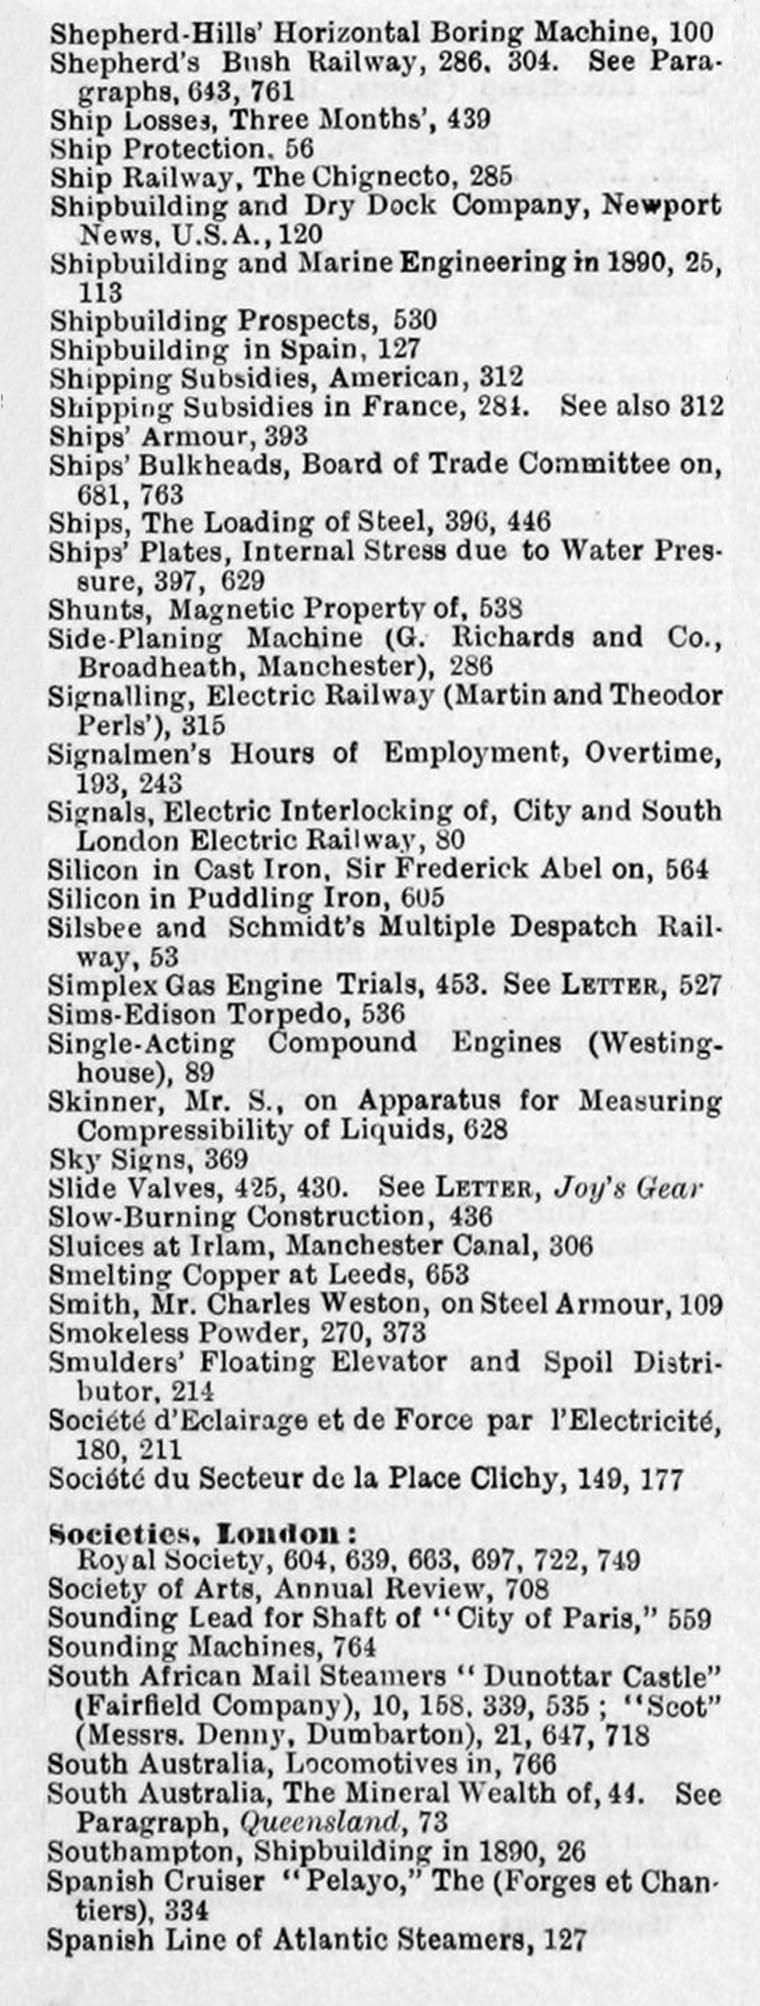 Engineering 1891 Jan-Jun: Index: General Index - Graces Guide